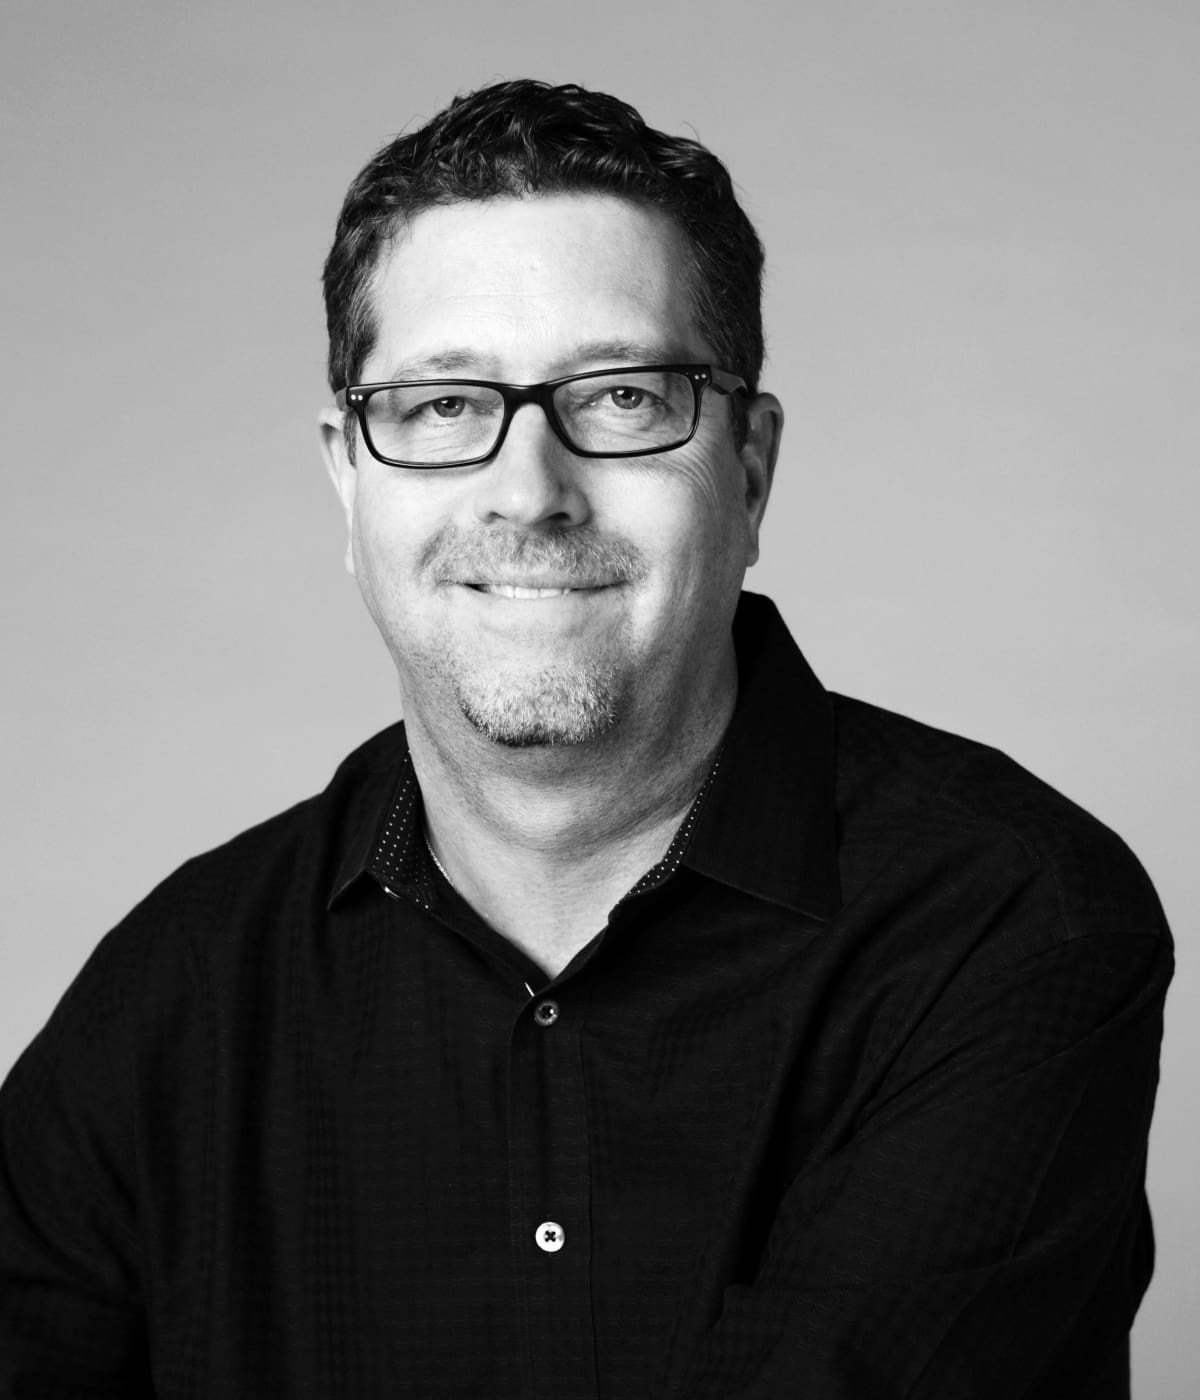 Patrick Beaty of Overland Property Group